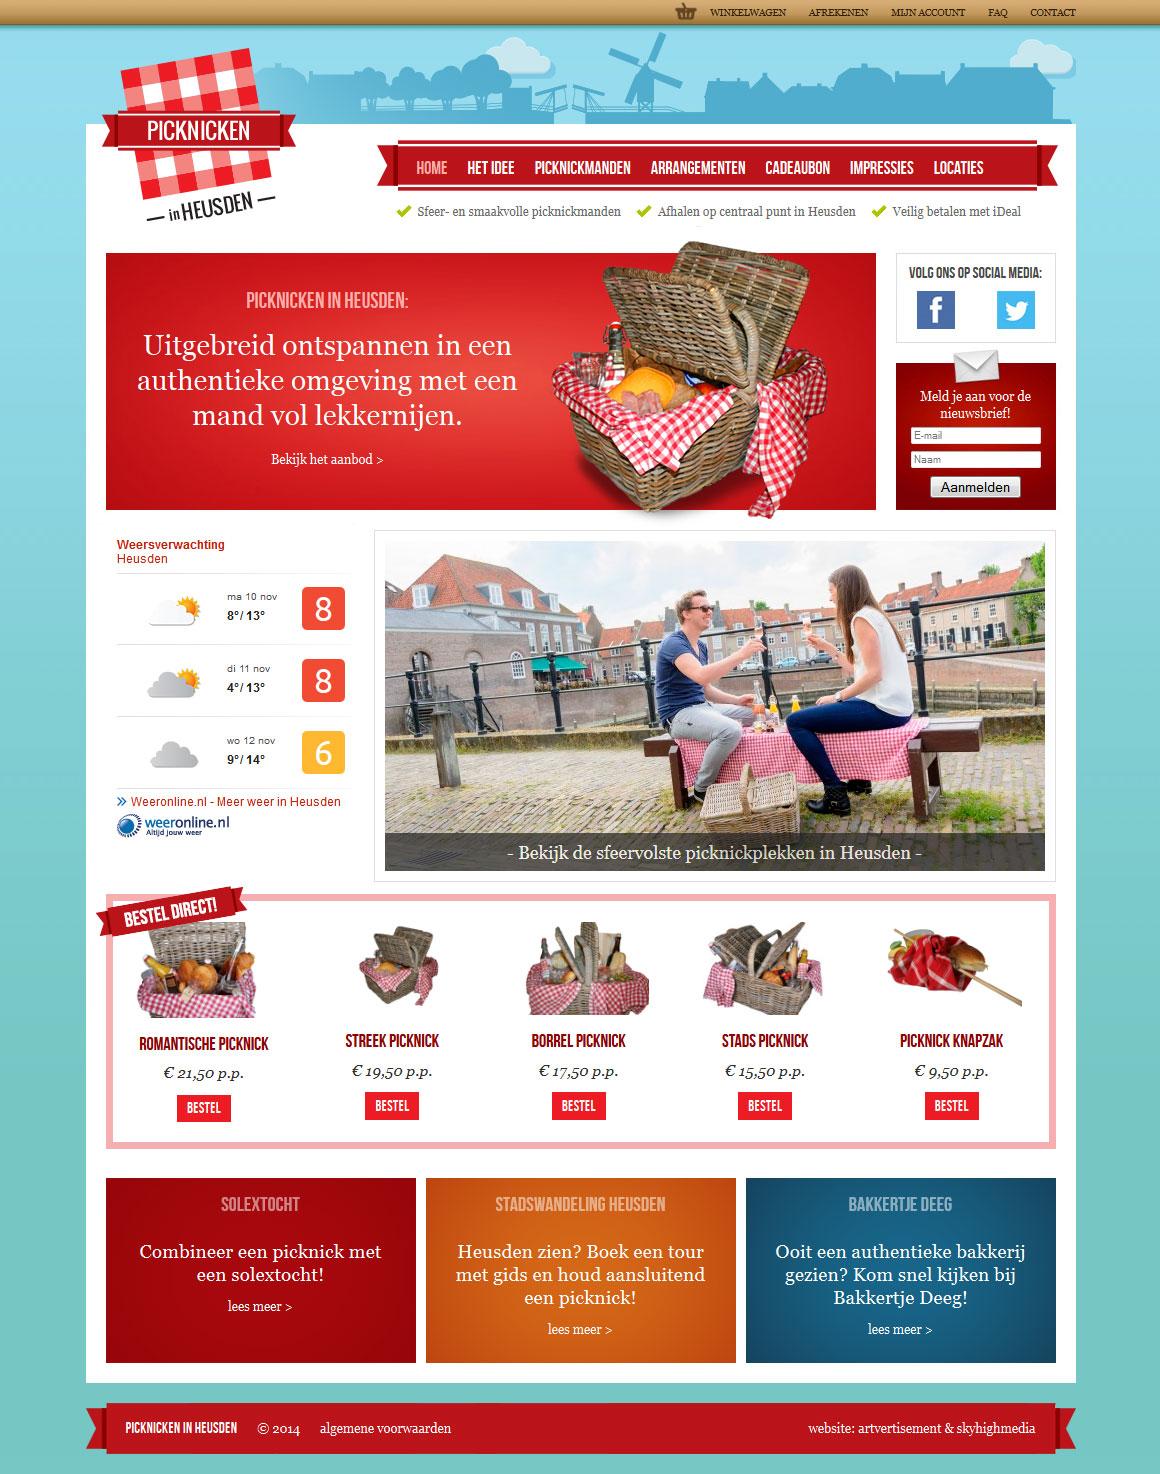 picknicken-heusden_website1